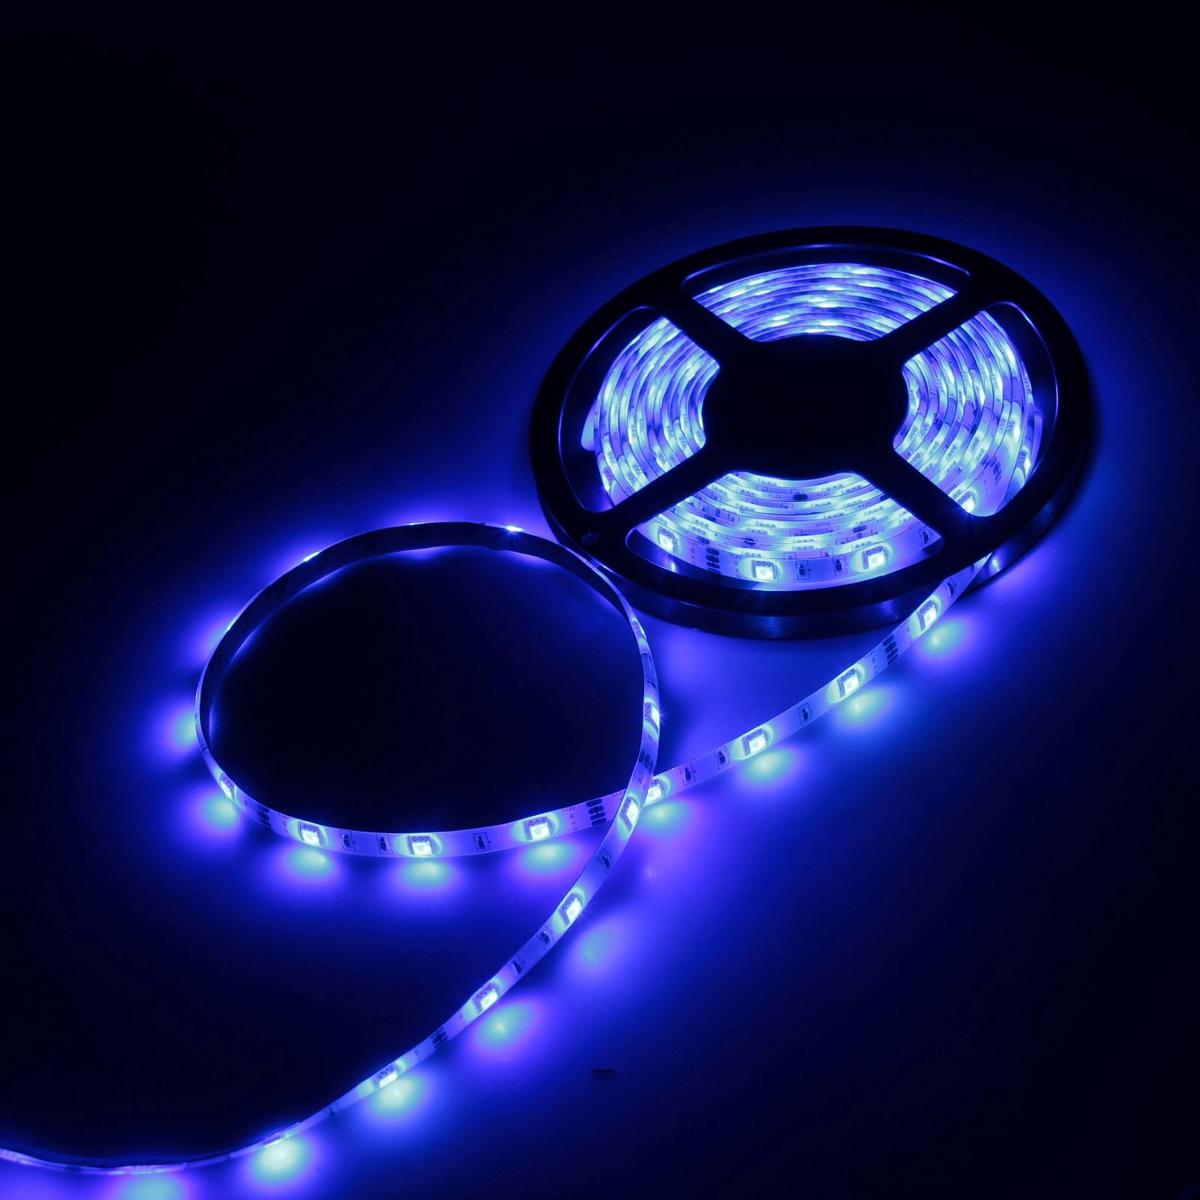 Светодиодная лента Luazon, 12В, SMD5050, длина 5 м, IP65, 30 LED ламп, 7.2 Вт/м, 14-16 Лм/1 LED, DC, цвет: синий светодиодная лента luazon 12в smd3528 длина 5 м ip68 60 led ламп 4 8 вт м 6 7 лм 1 led dc цвет фиолетовый